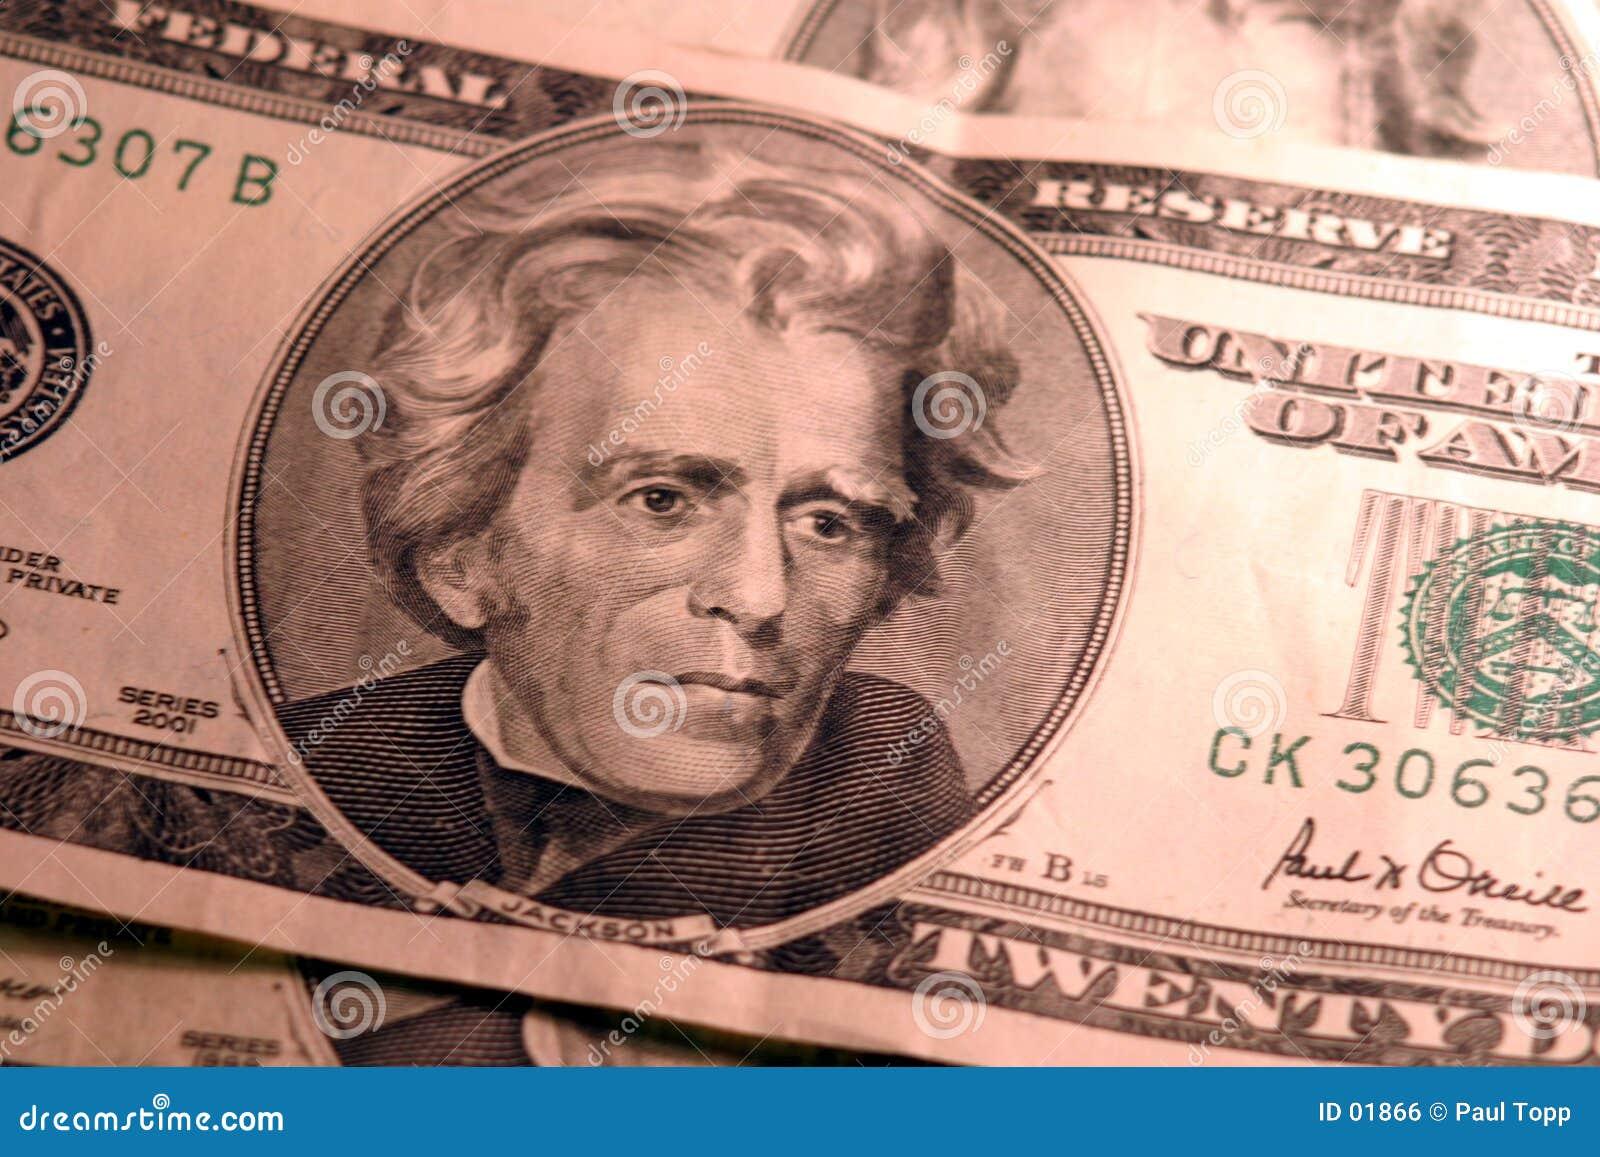 20 Dollar Bills